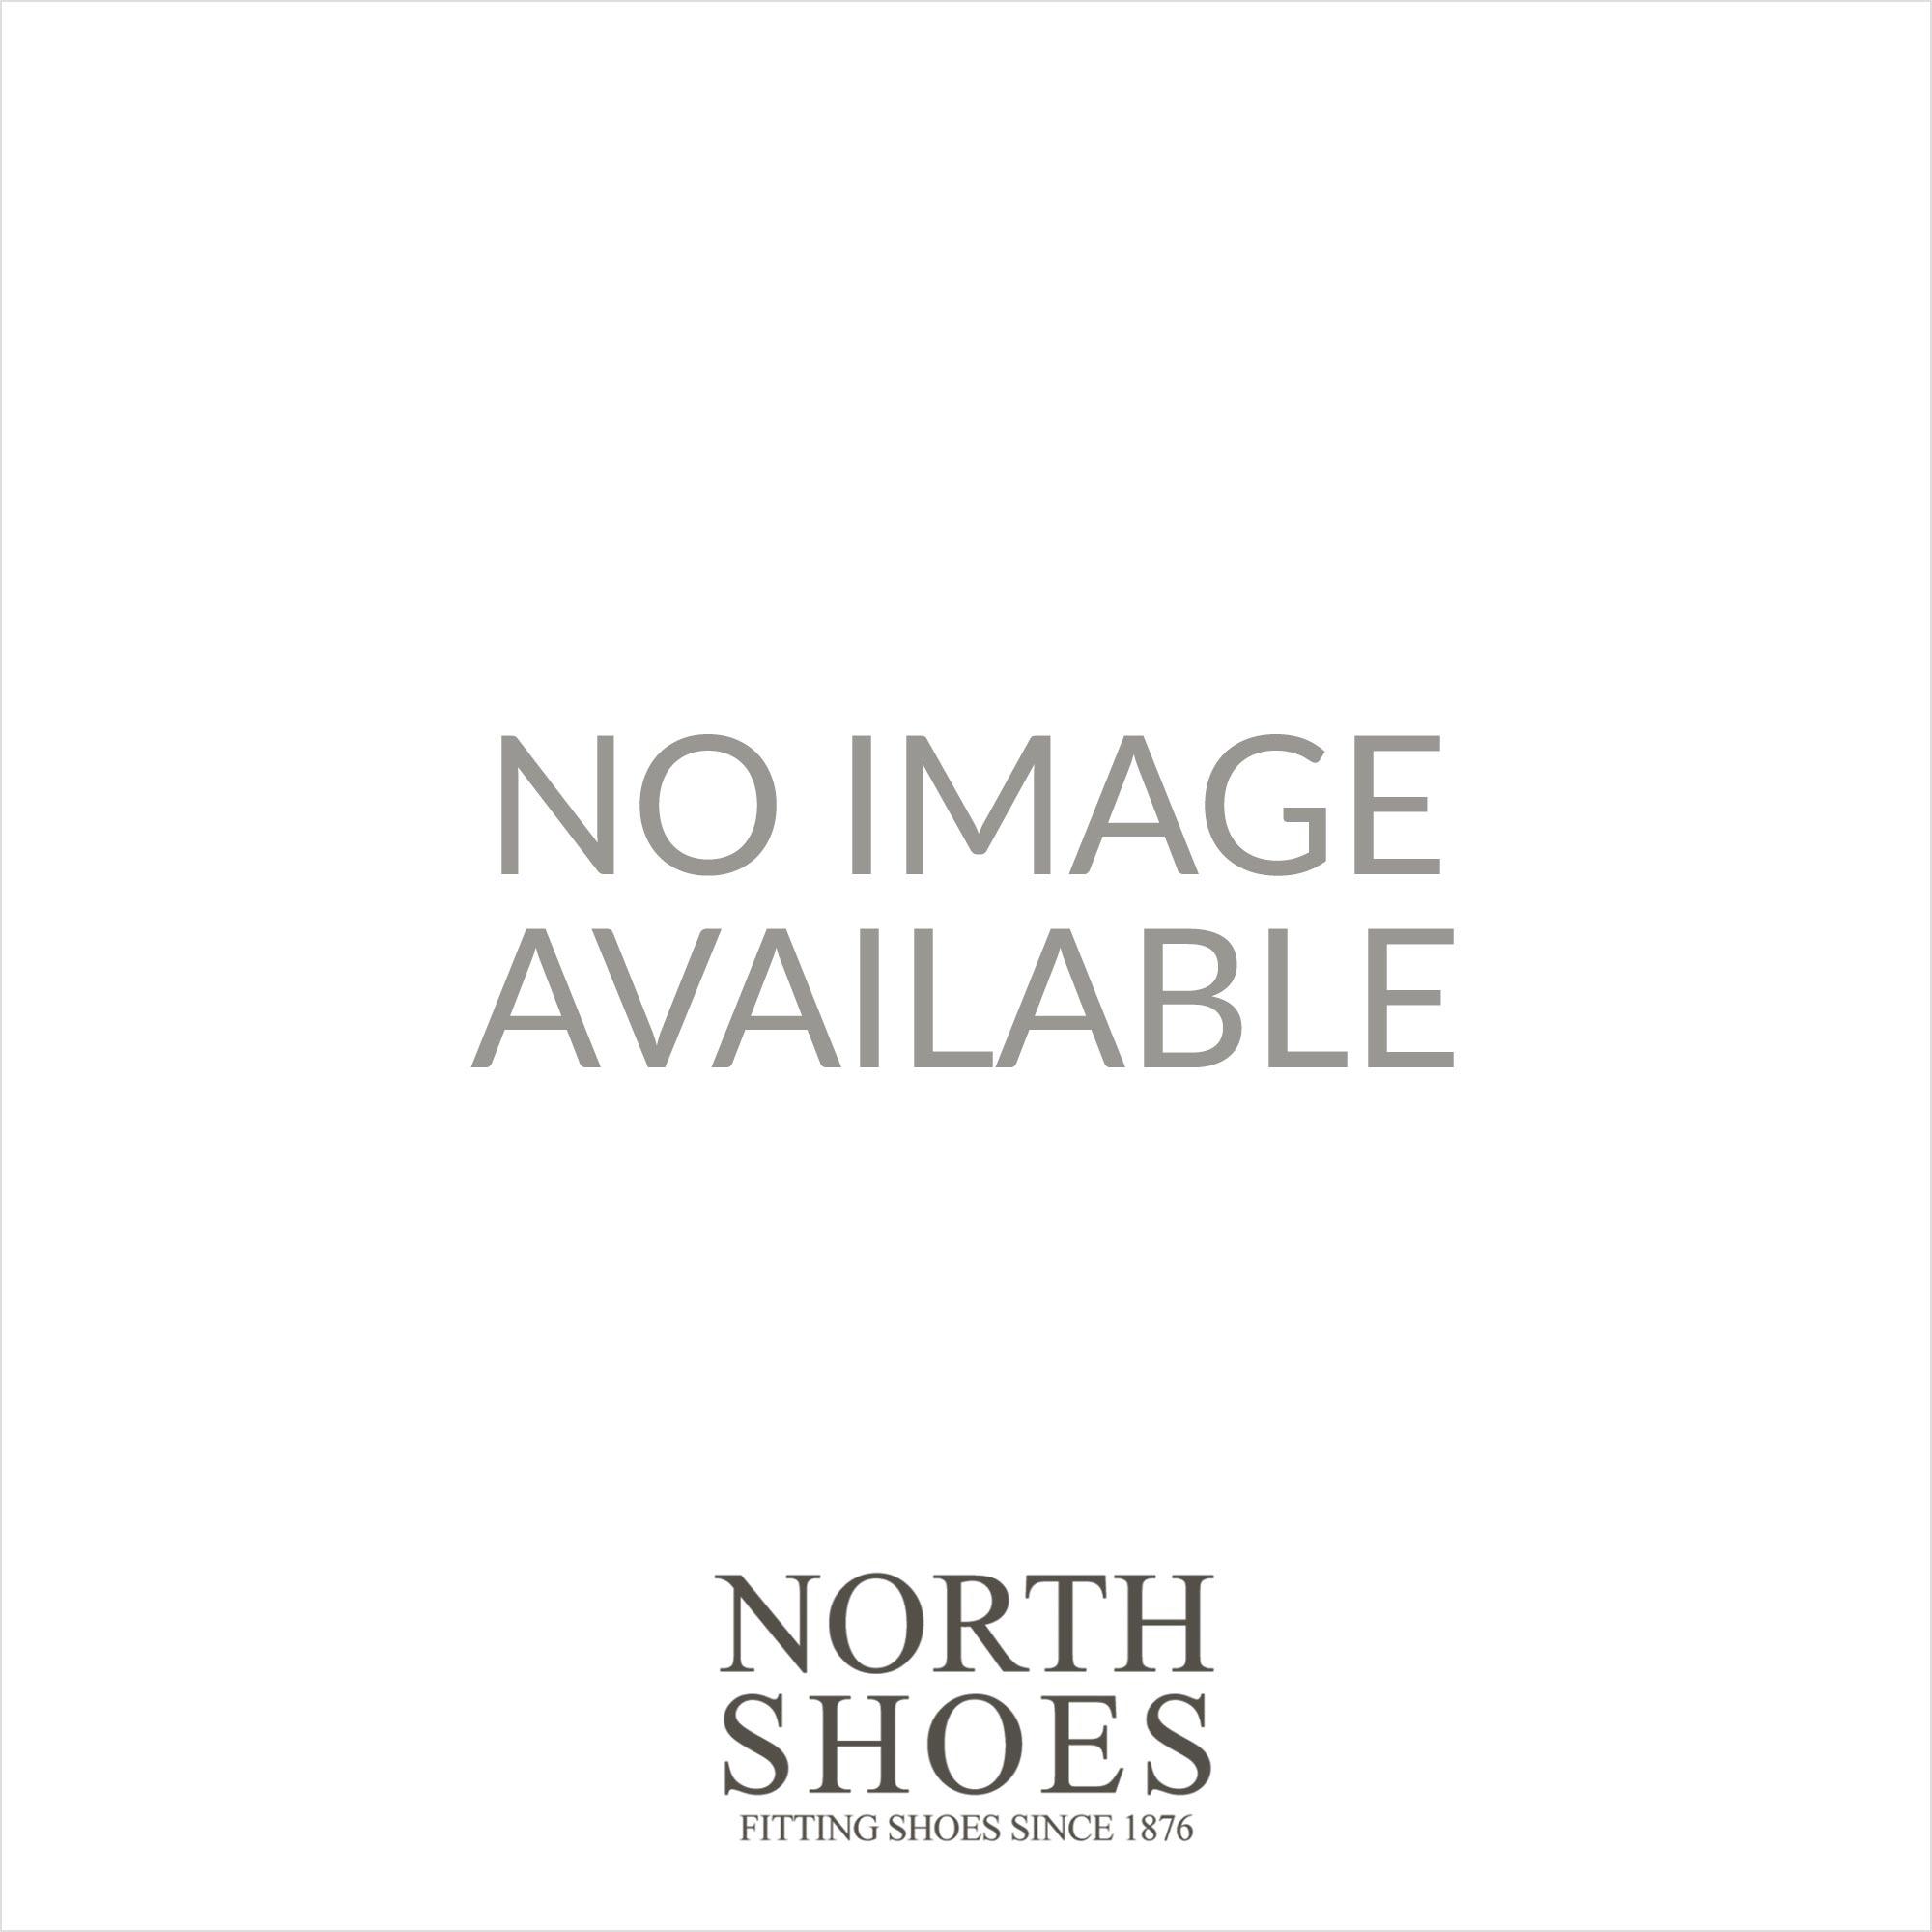 cce38bb0c93 Stephanie Burgundy Nubuck/Leather Girls Winter Mid Calf Boots